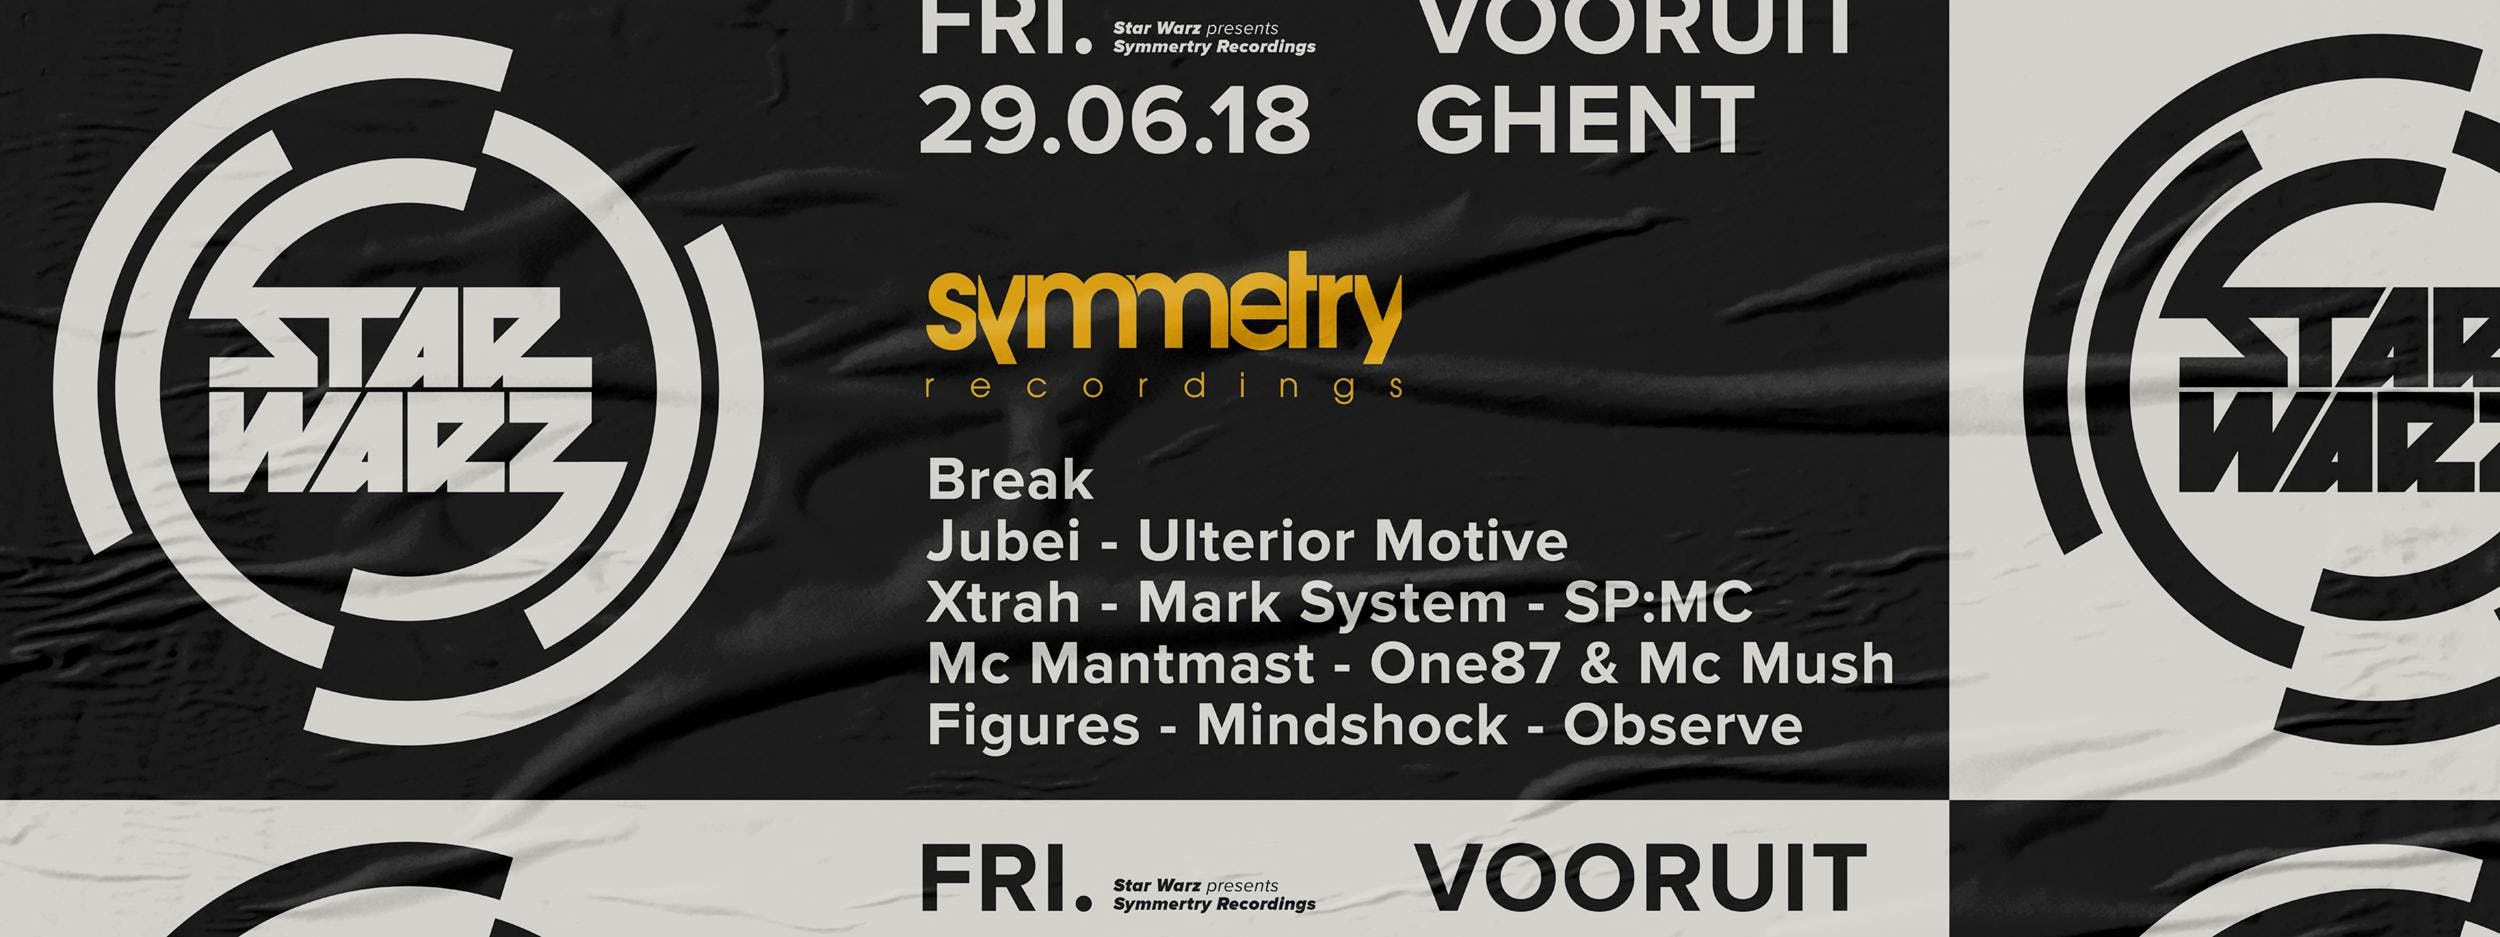 Star Warz presents Symmetry Recordings